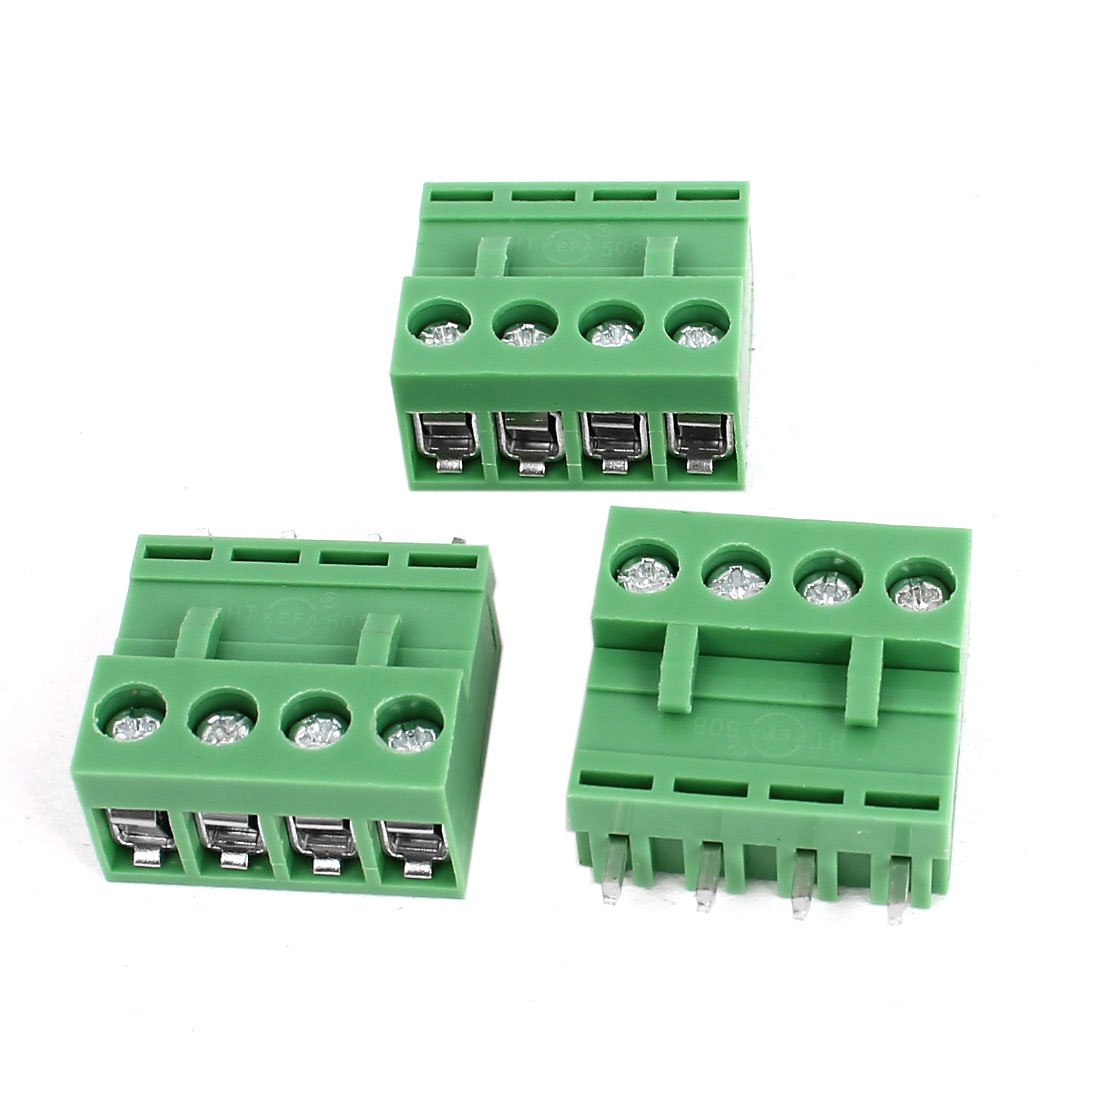 300V 10A 4 Pin 5.08mm Single Row PCB Screw Terminal Block 3pcs Green